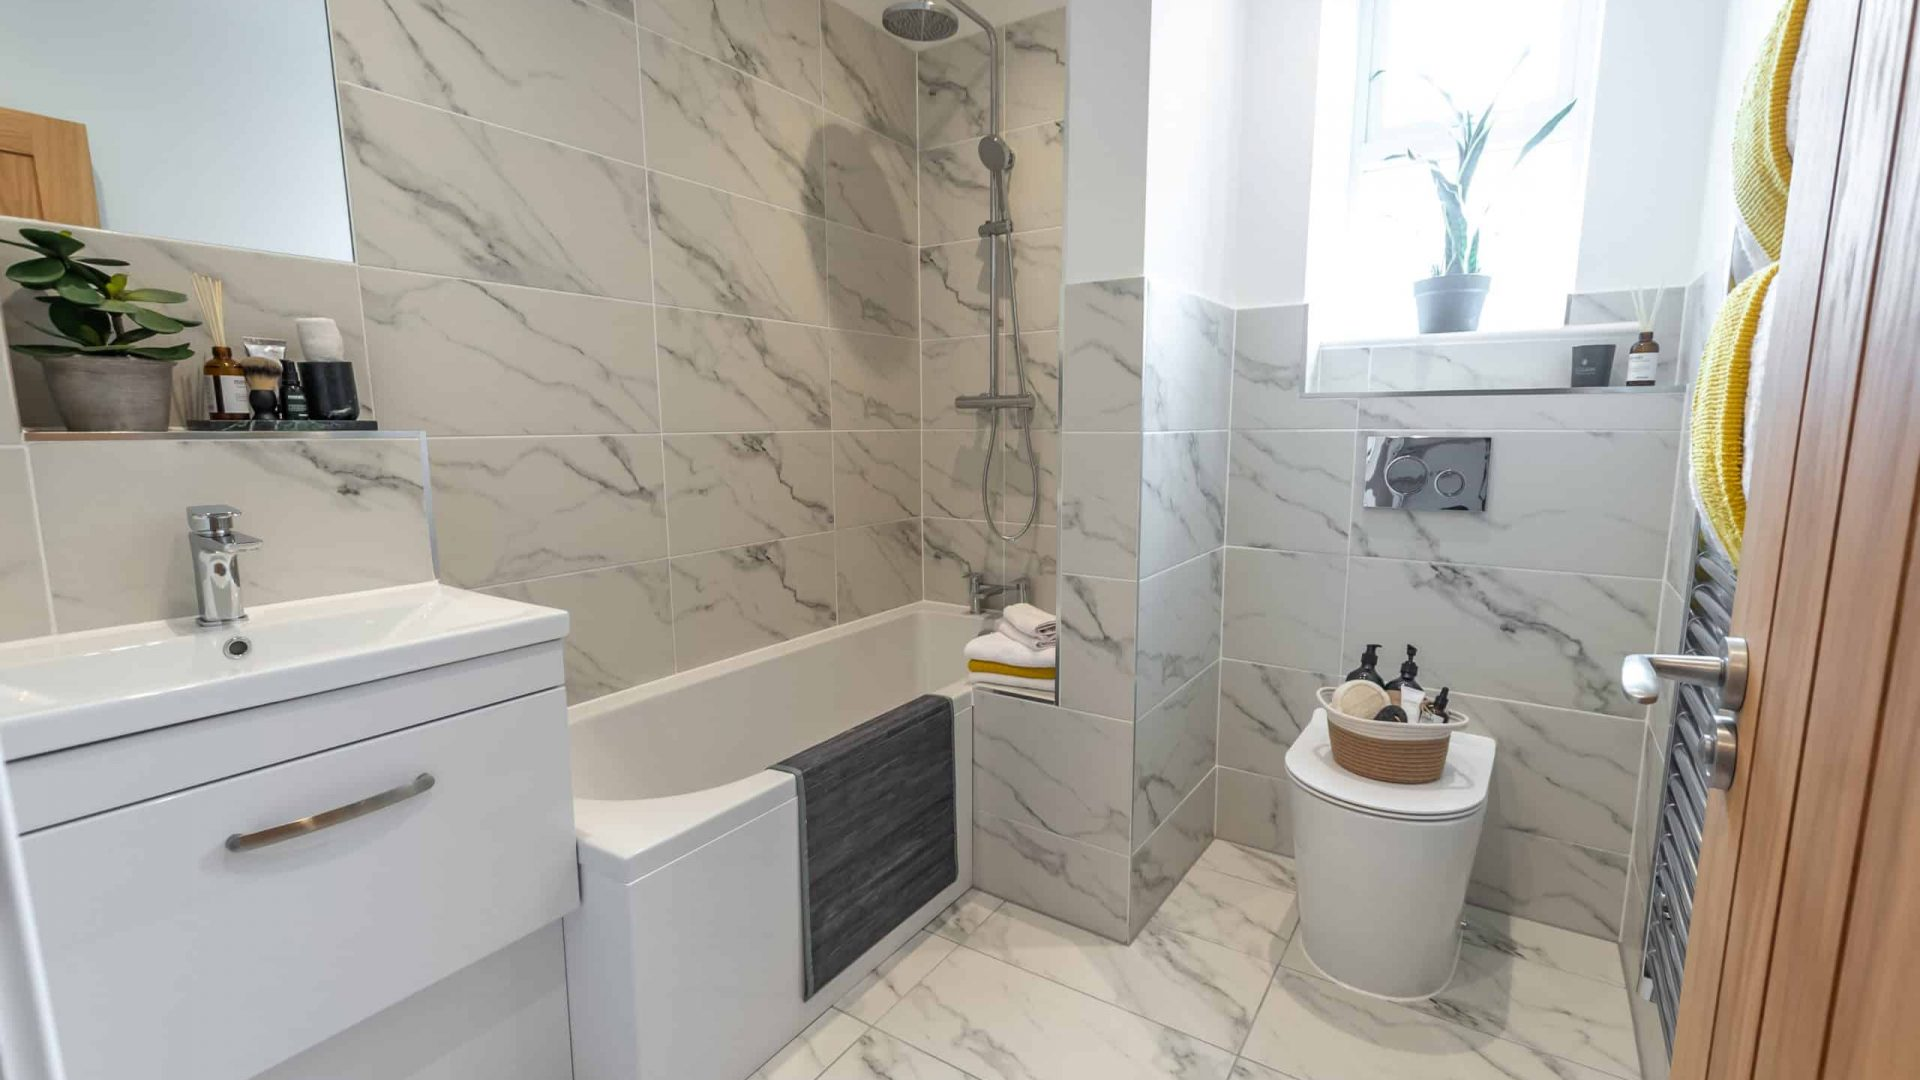 Southern House Property: Bathroom